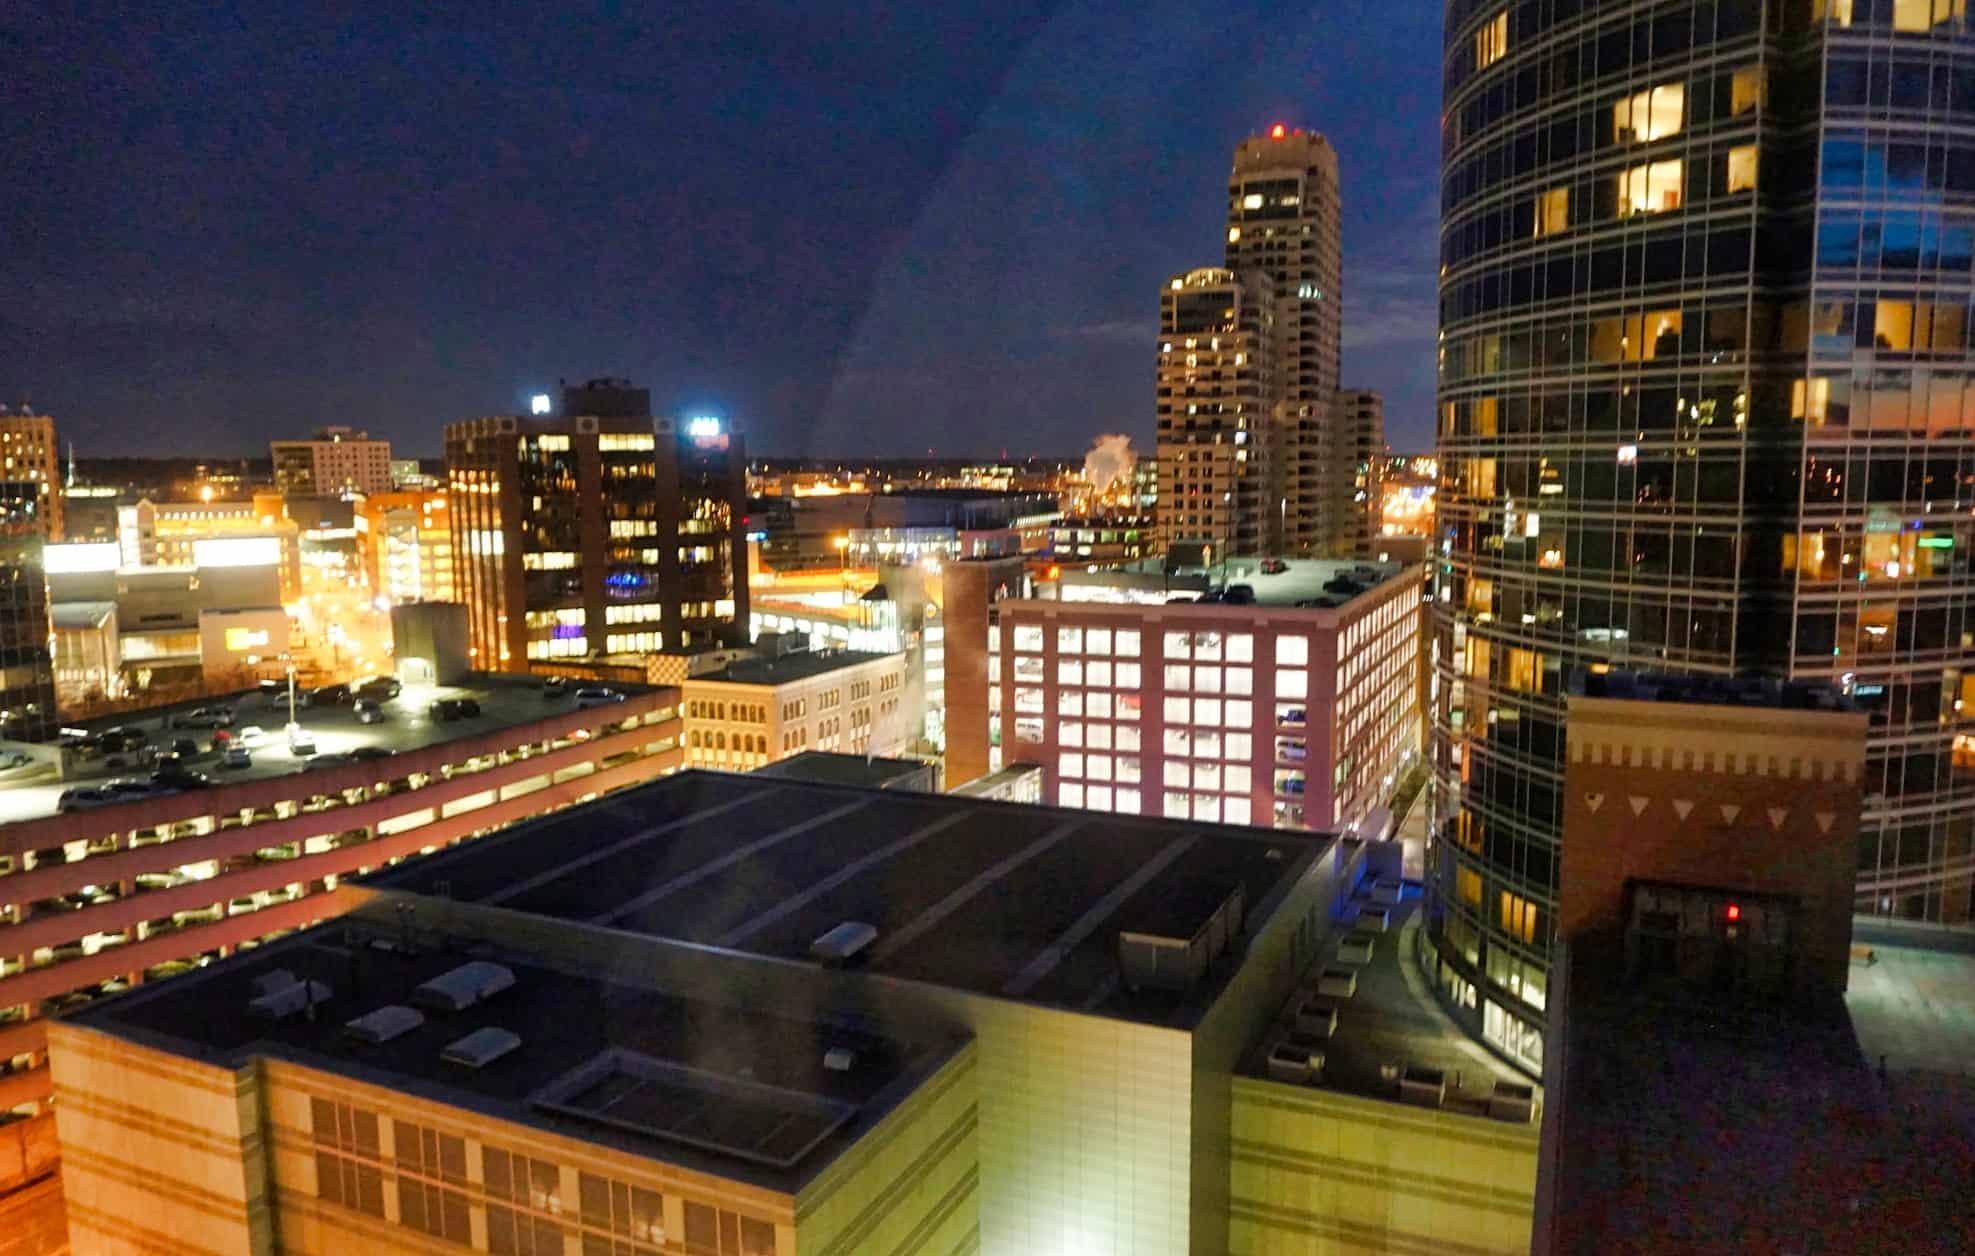 Grand Rapids - Amway Grand Plaza 3 - Kate Ter Haar via Flickr